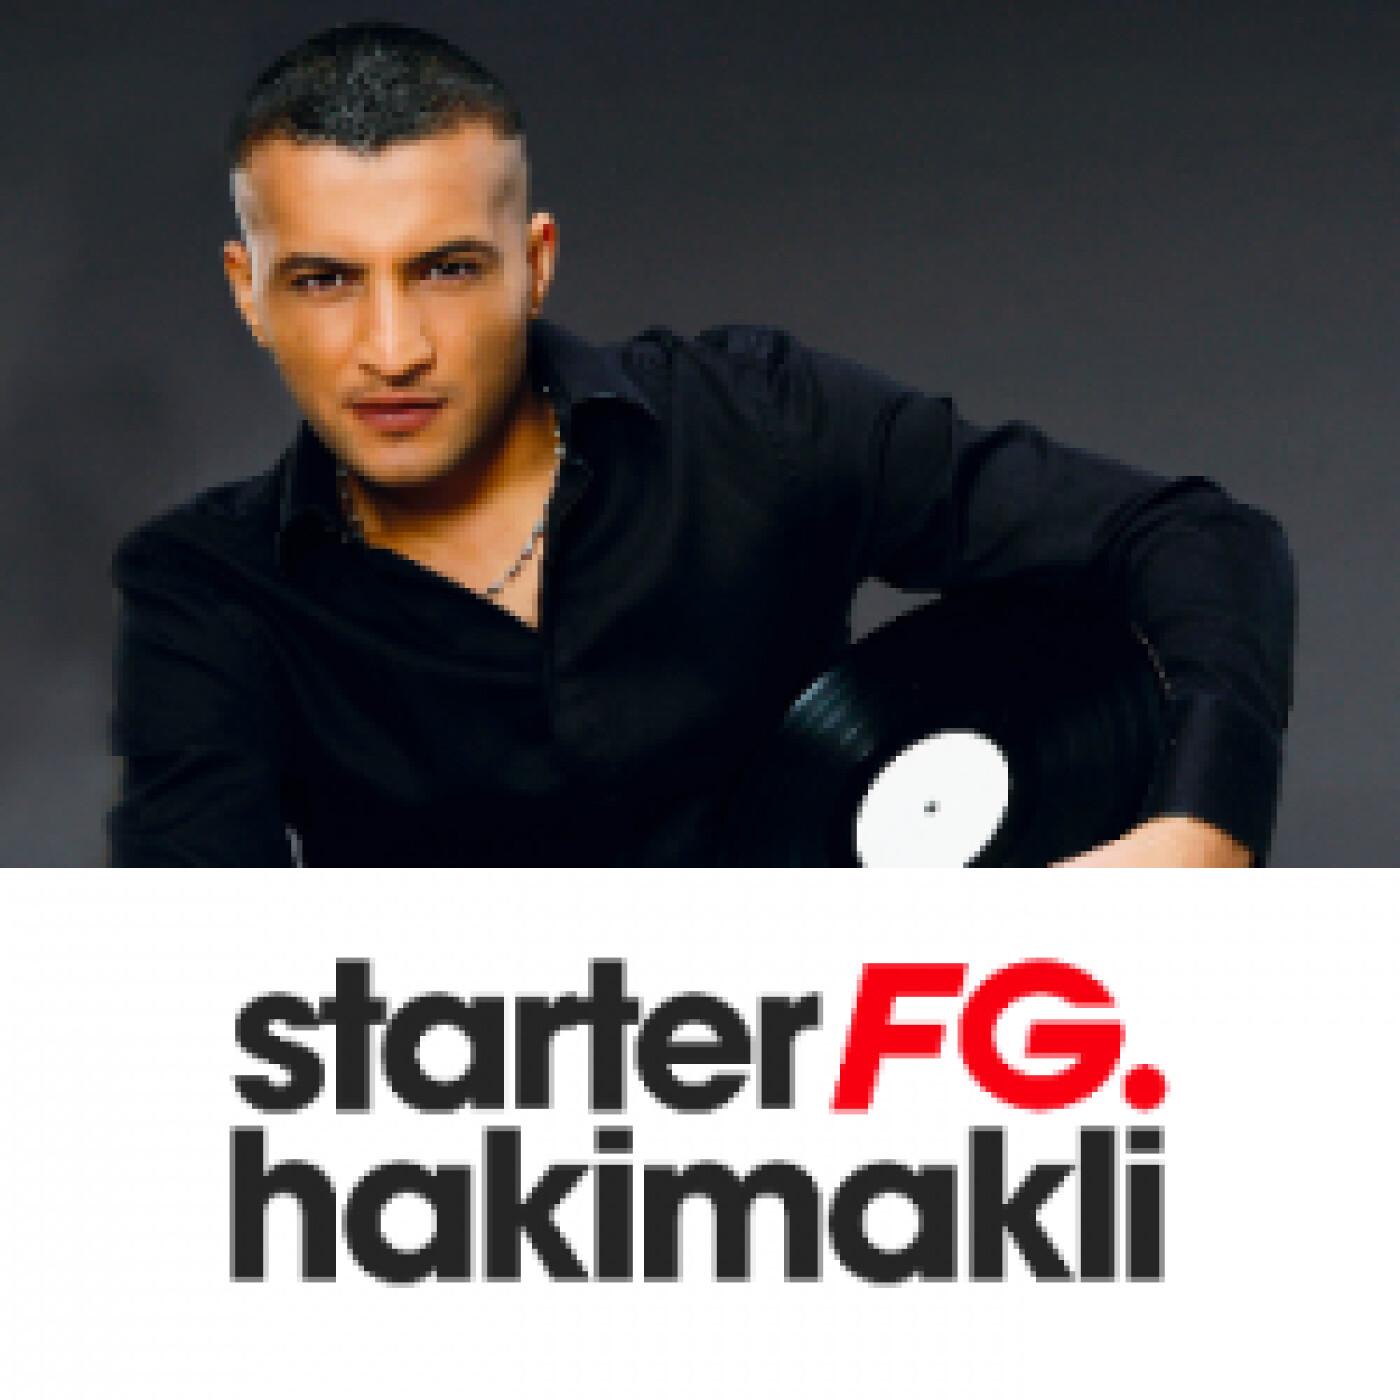 STARTER FG BY HAKIMAKLI MARDI 11 MAI 2021